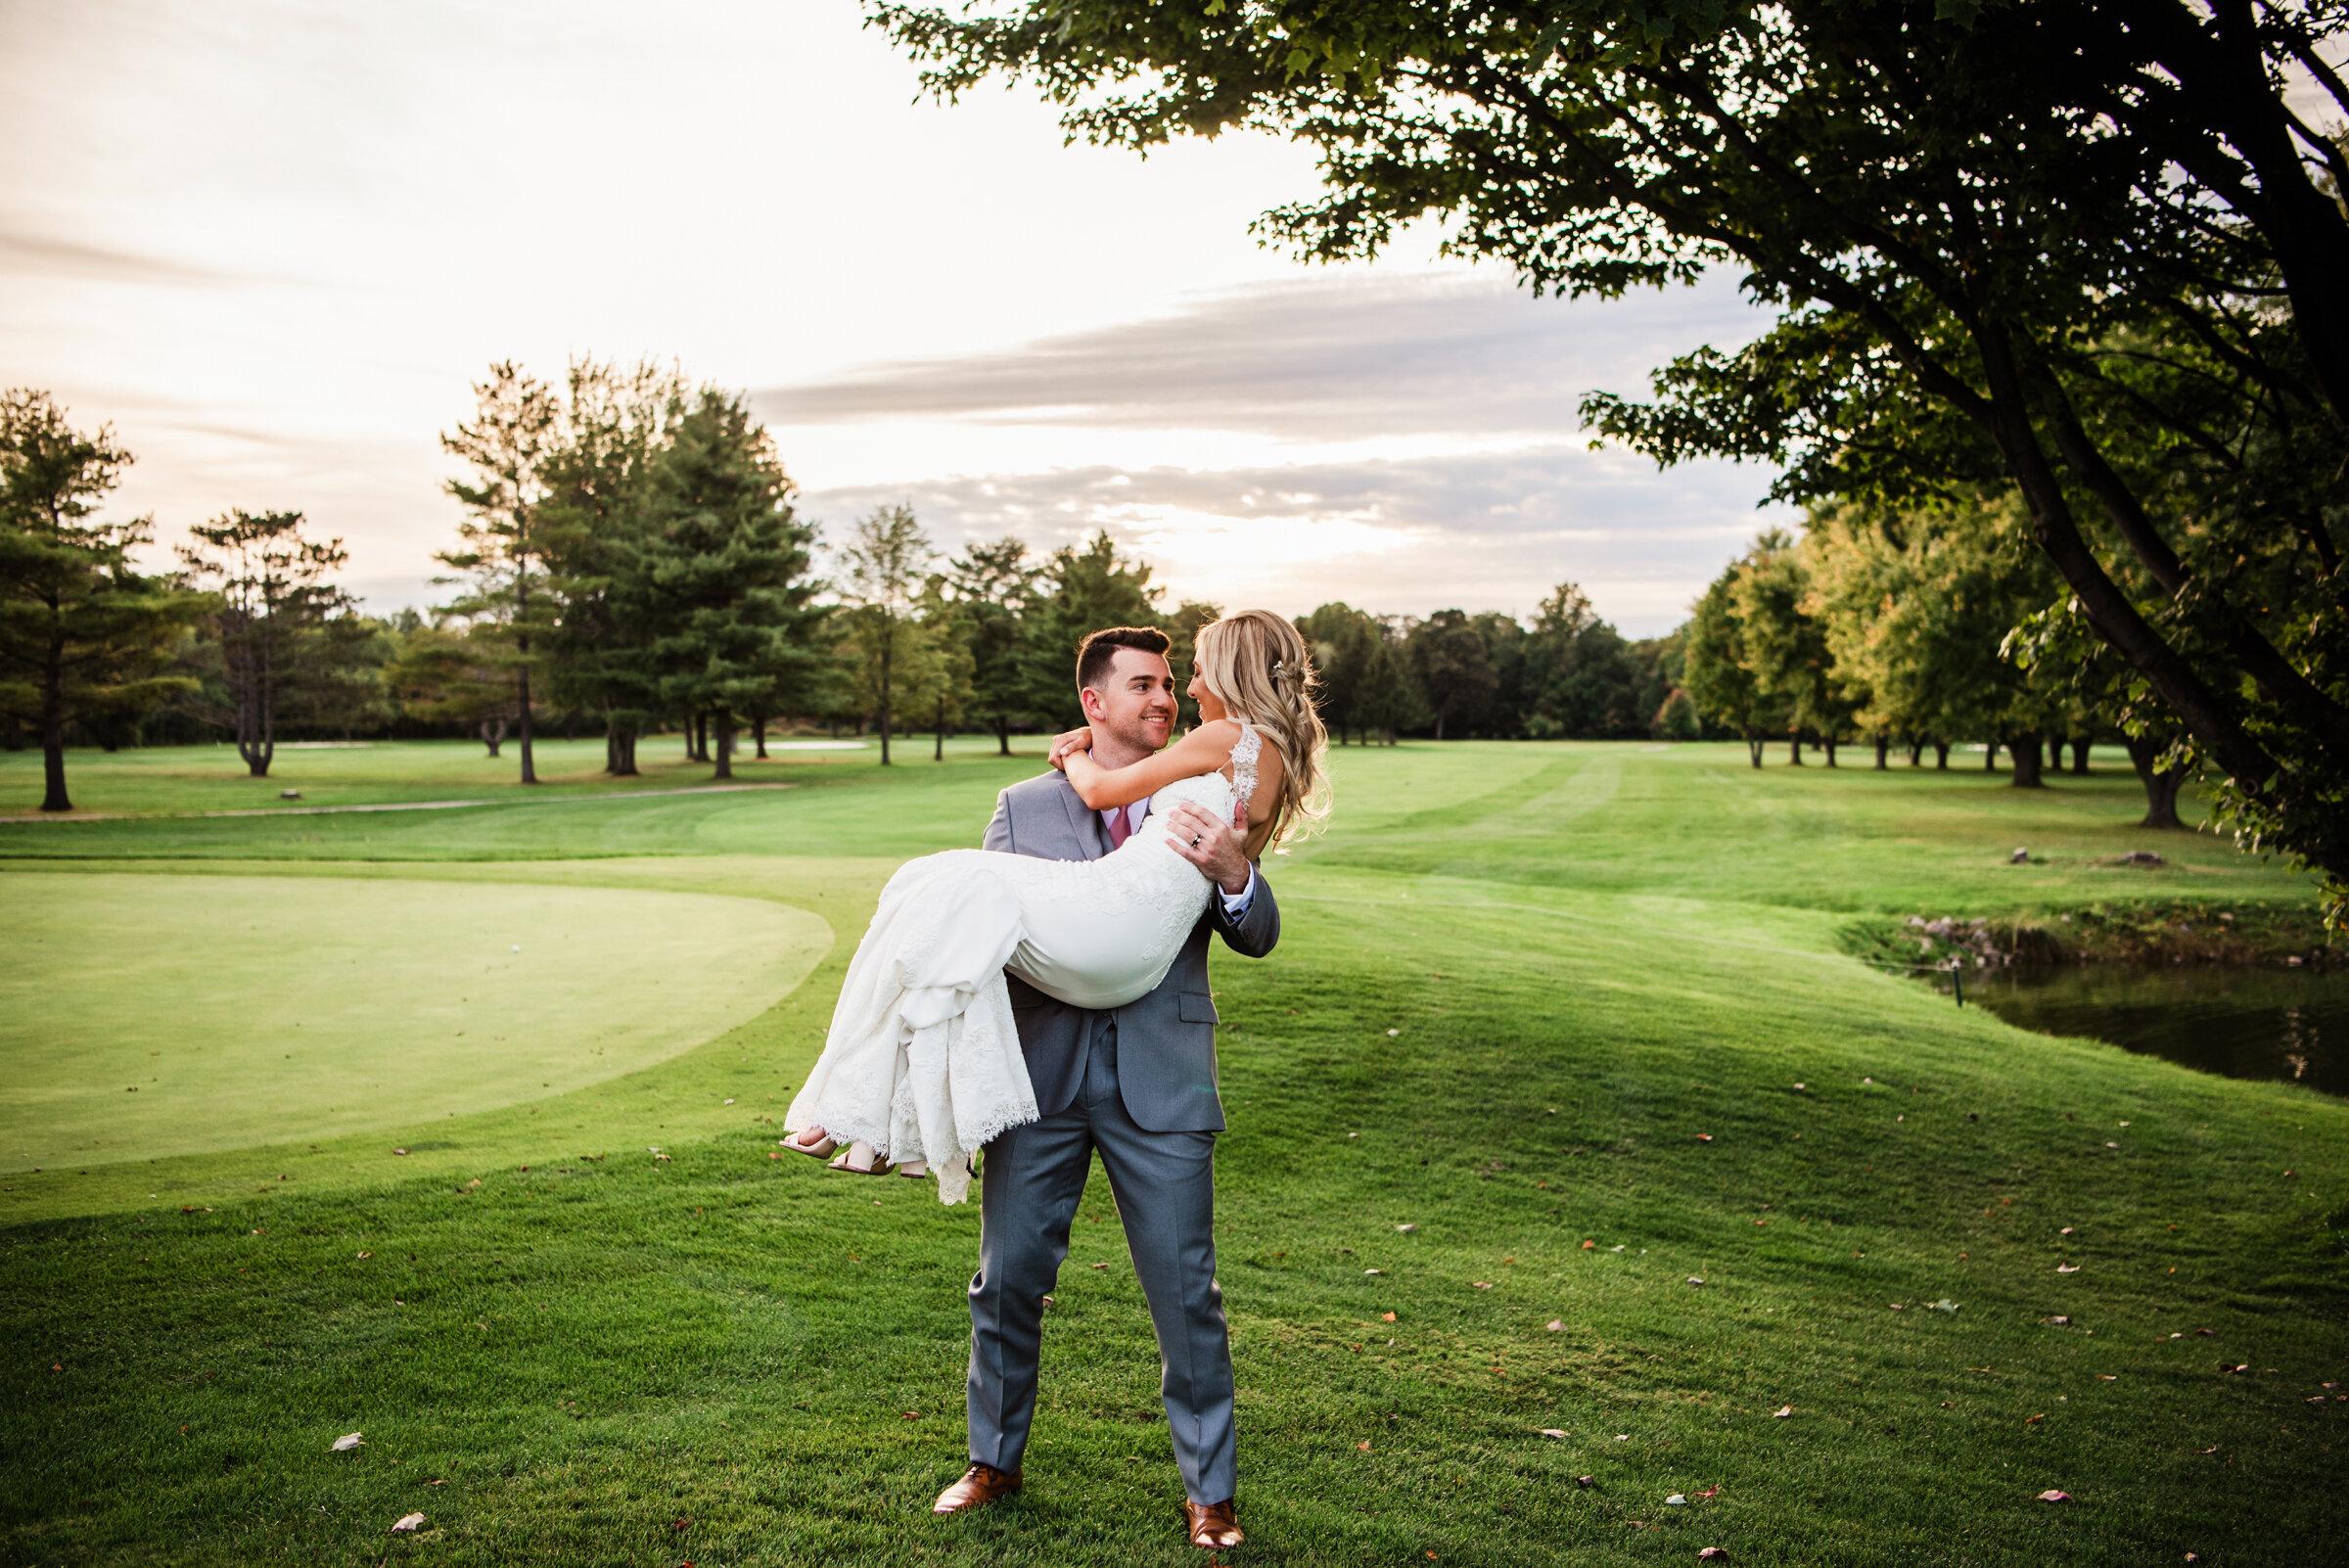 Deerfield_Country_Club_Rochester_Wedding_JILL_STUDIO_Rochester_NY_Photographer_DSC_6949.jpg